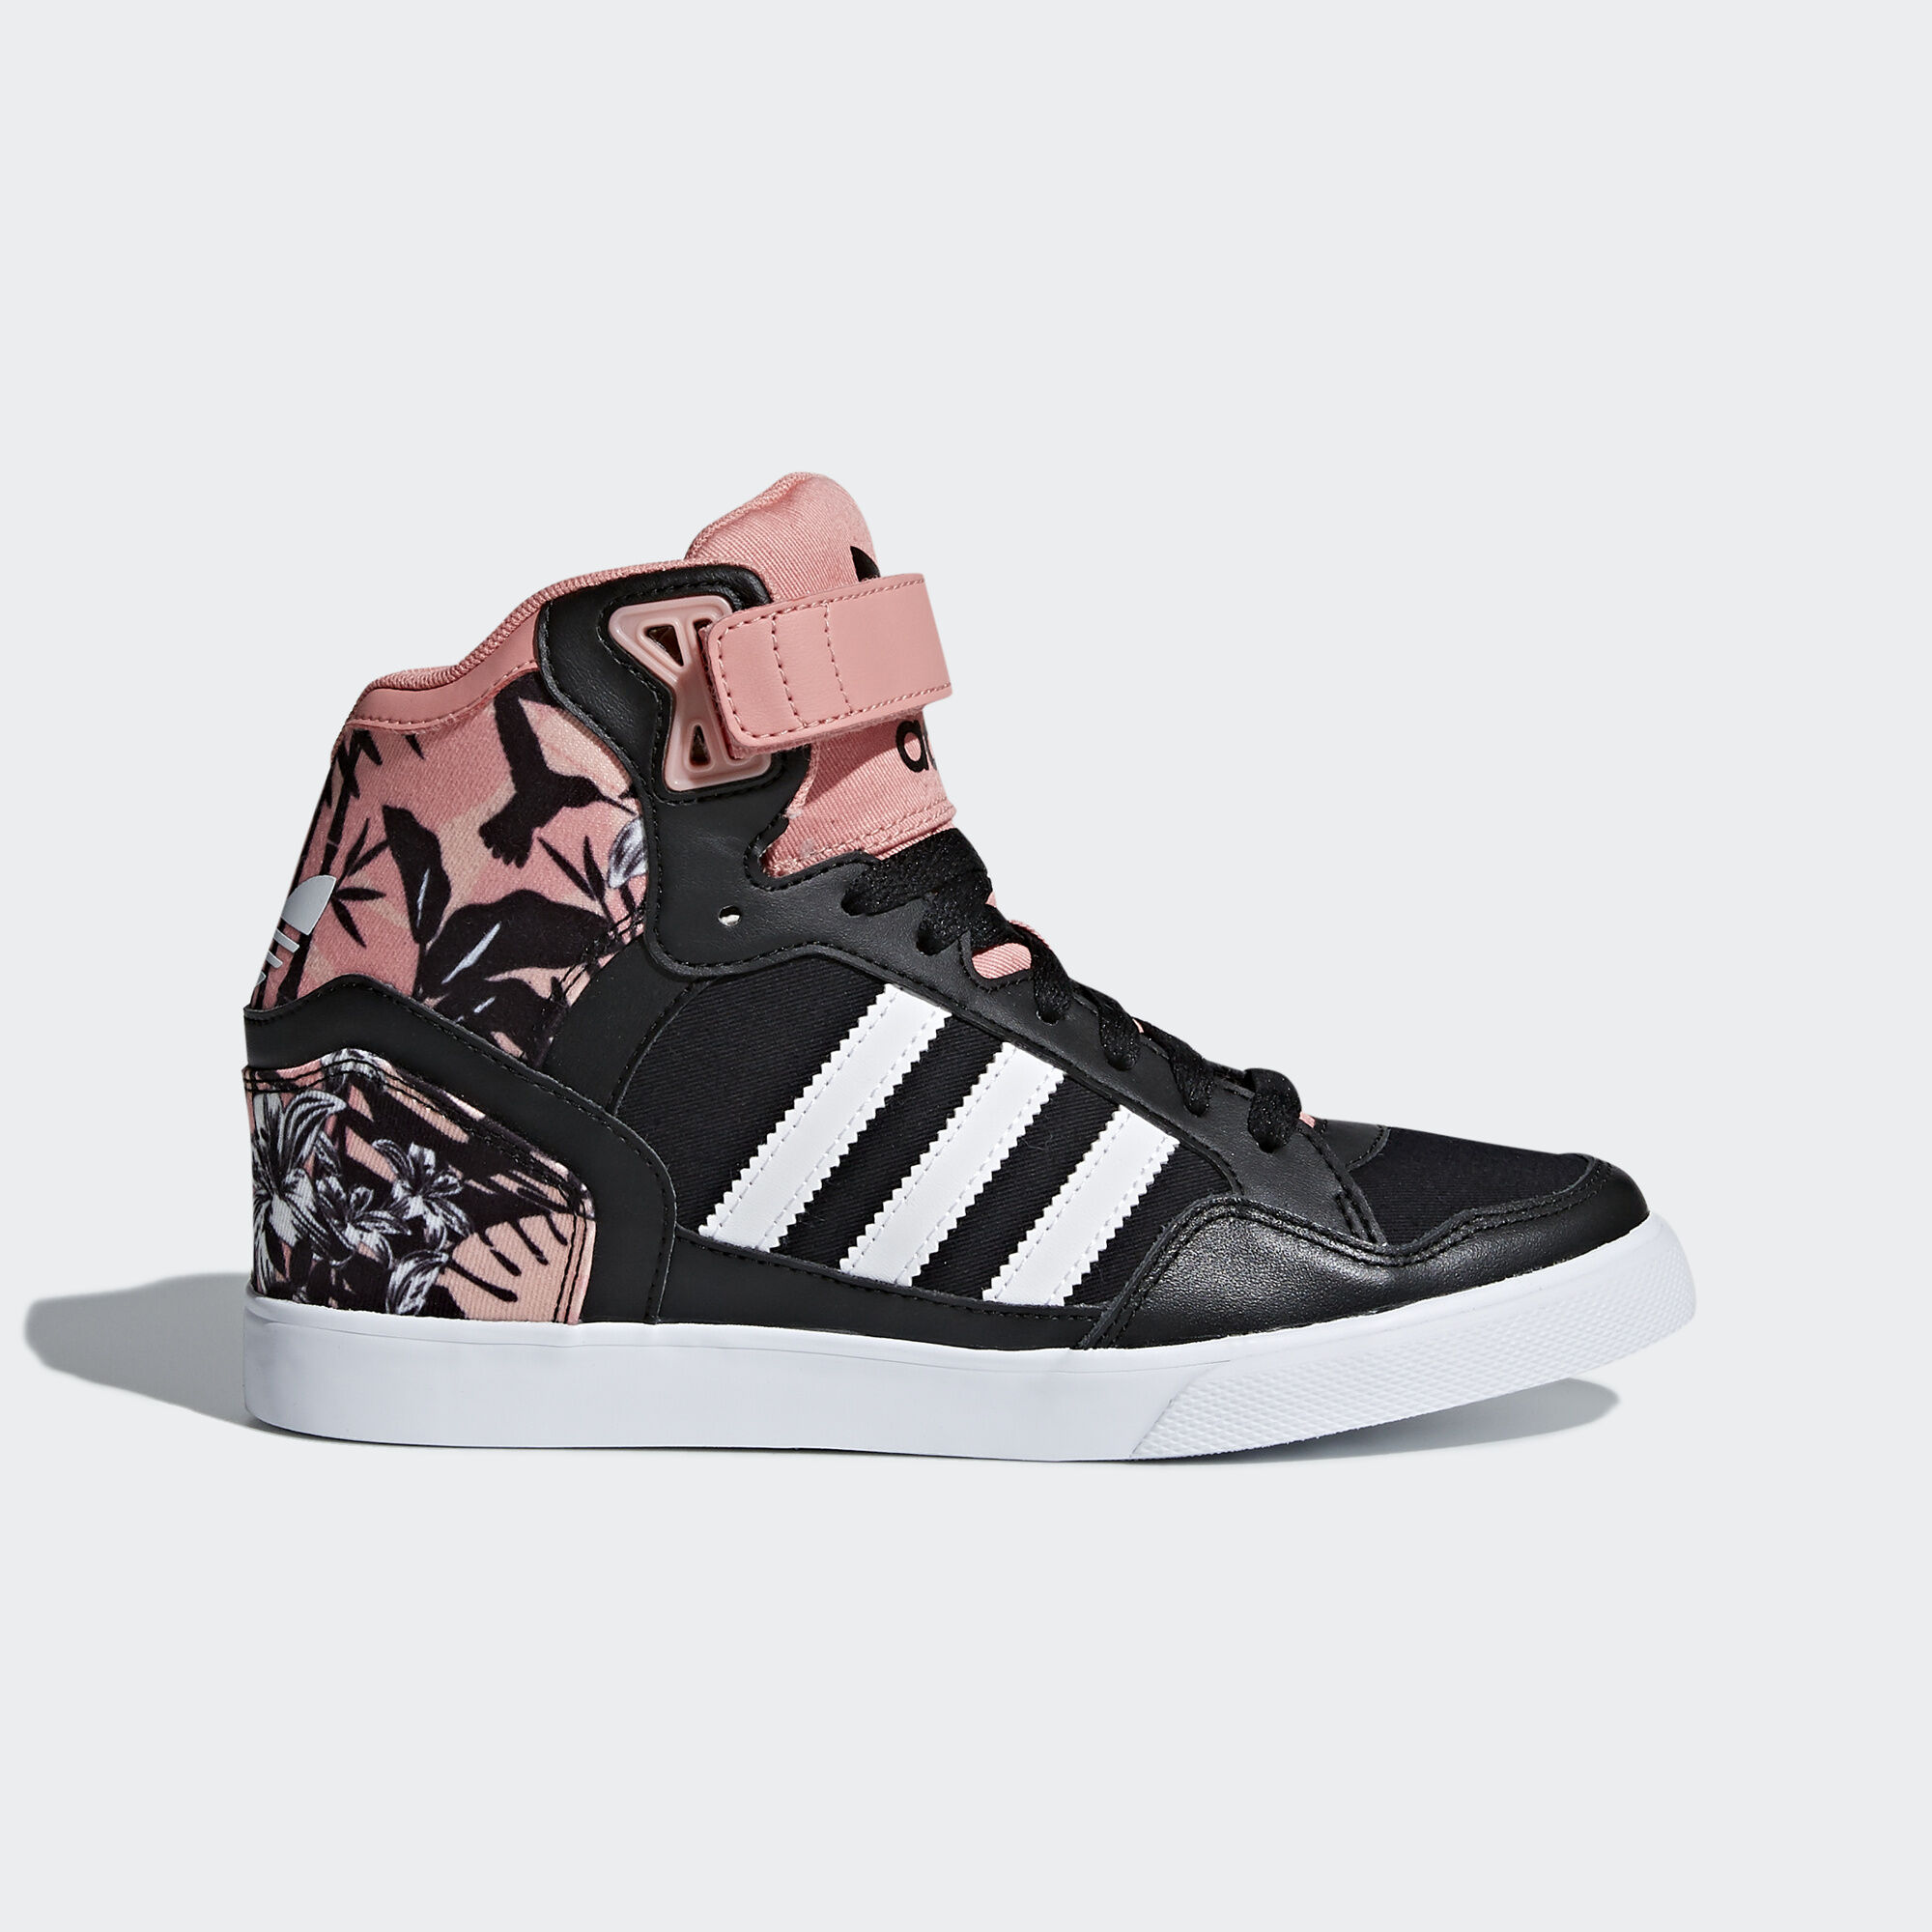 Adidas Extaball Up Mujer